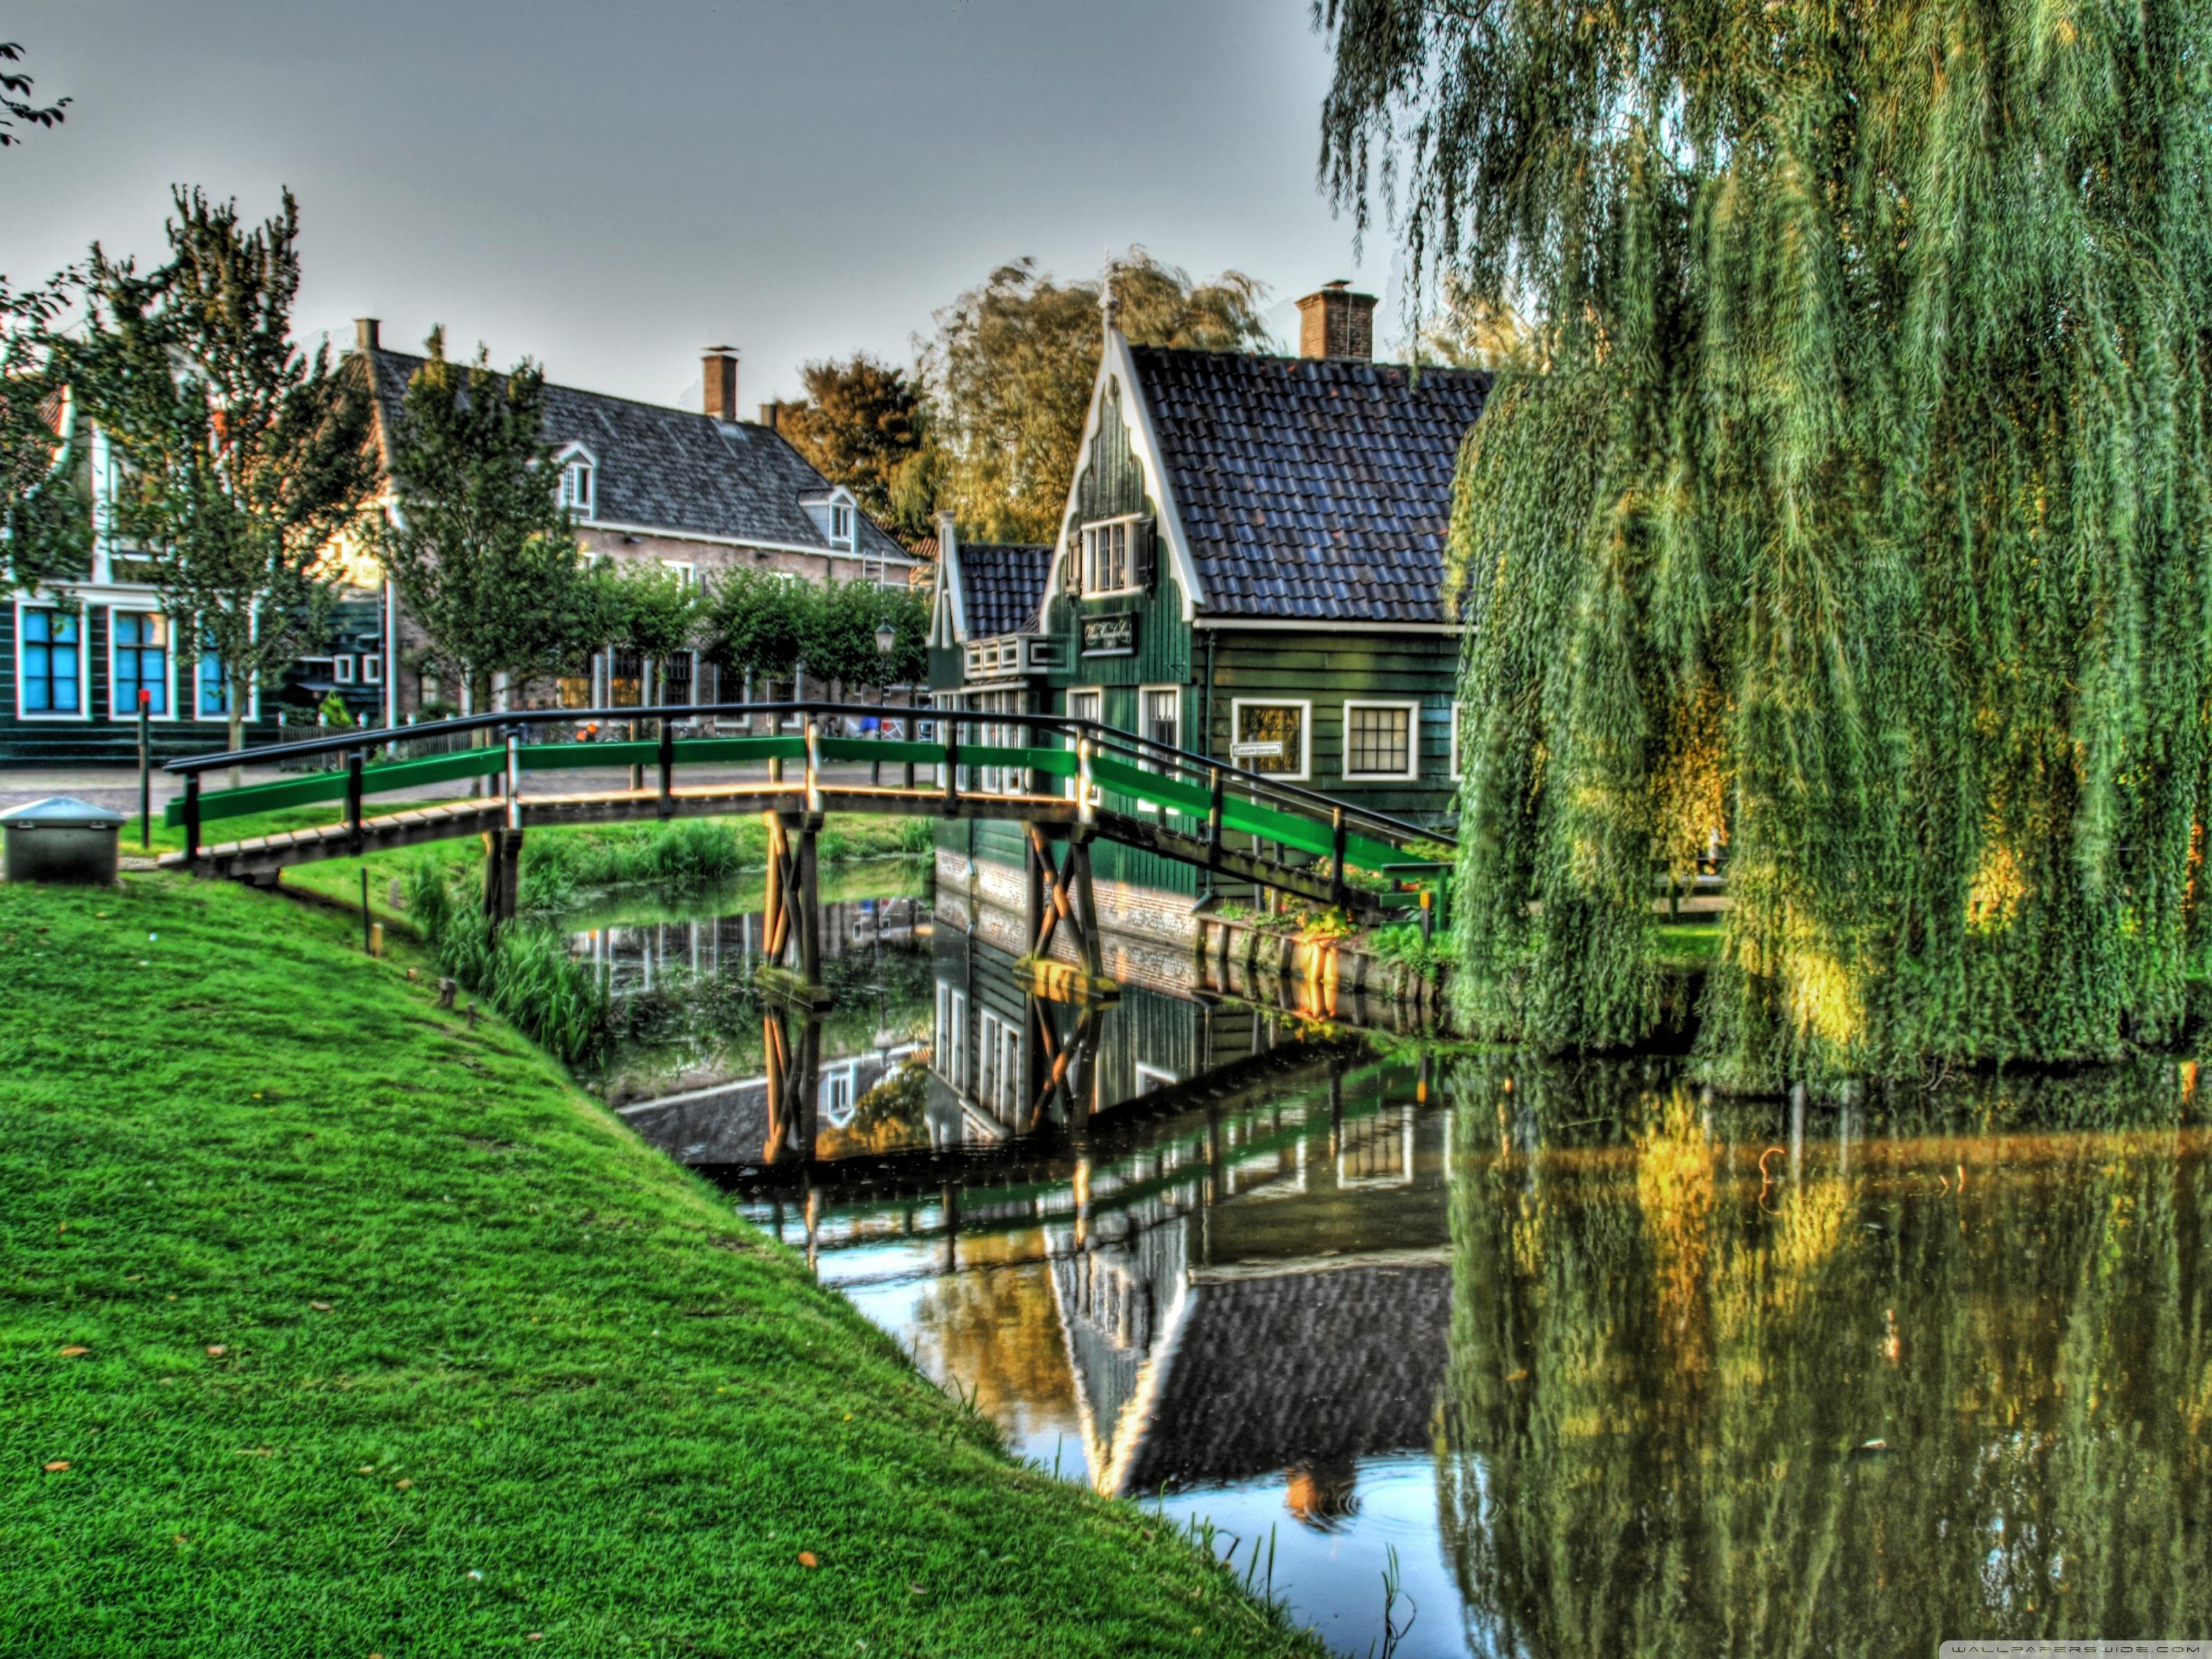 Фото на рабочий стол красивая деревня